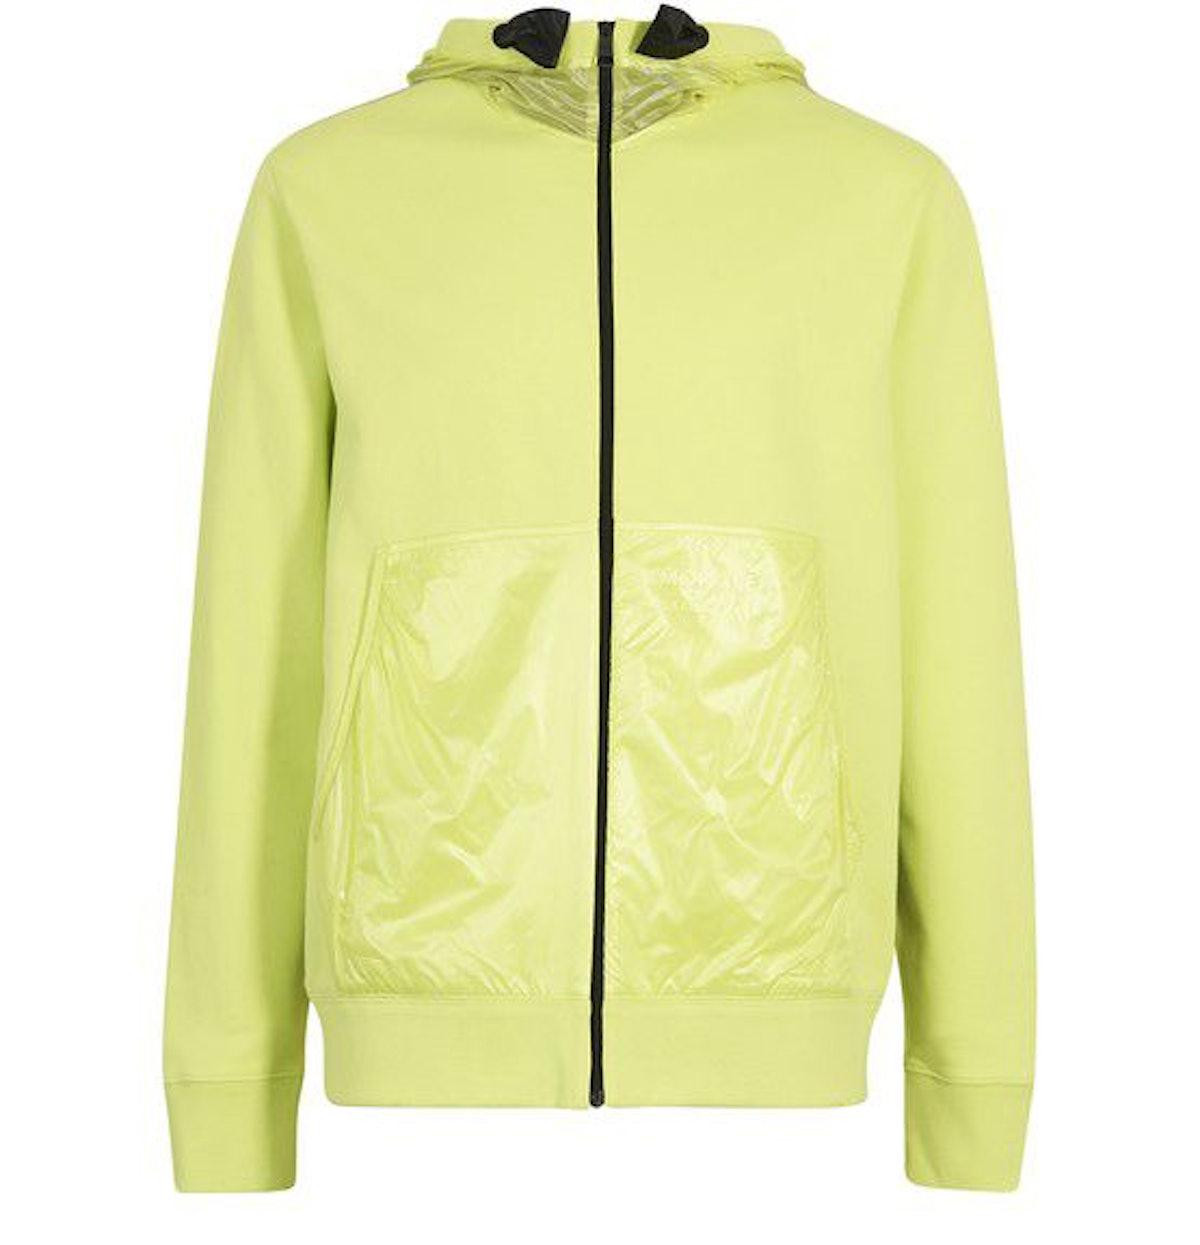 x Craig Green - Hooded jacket: image 1